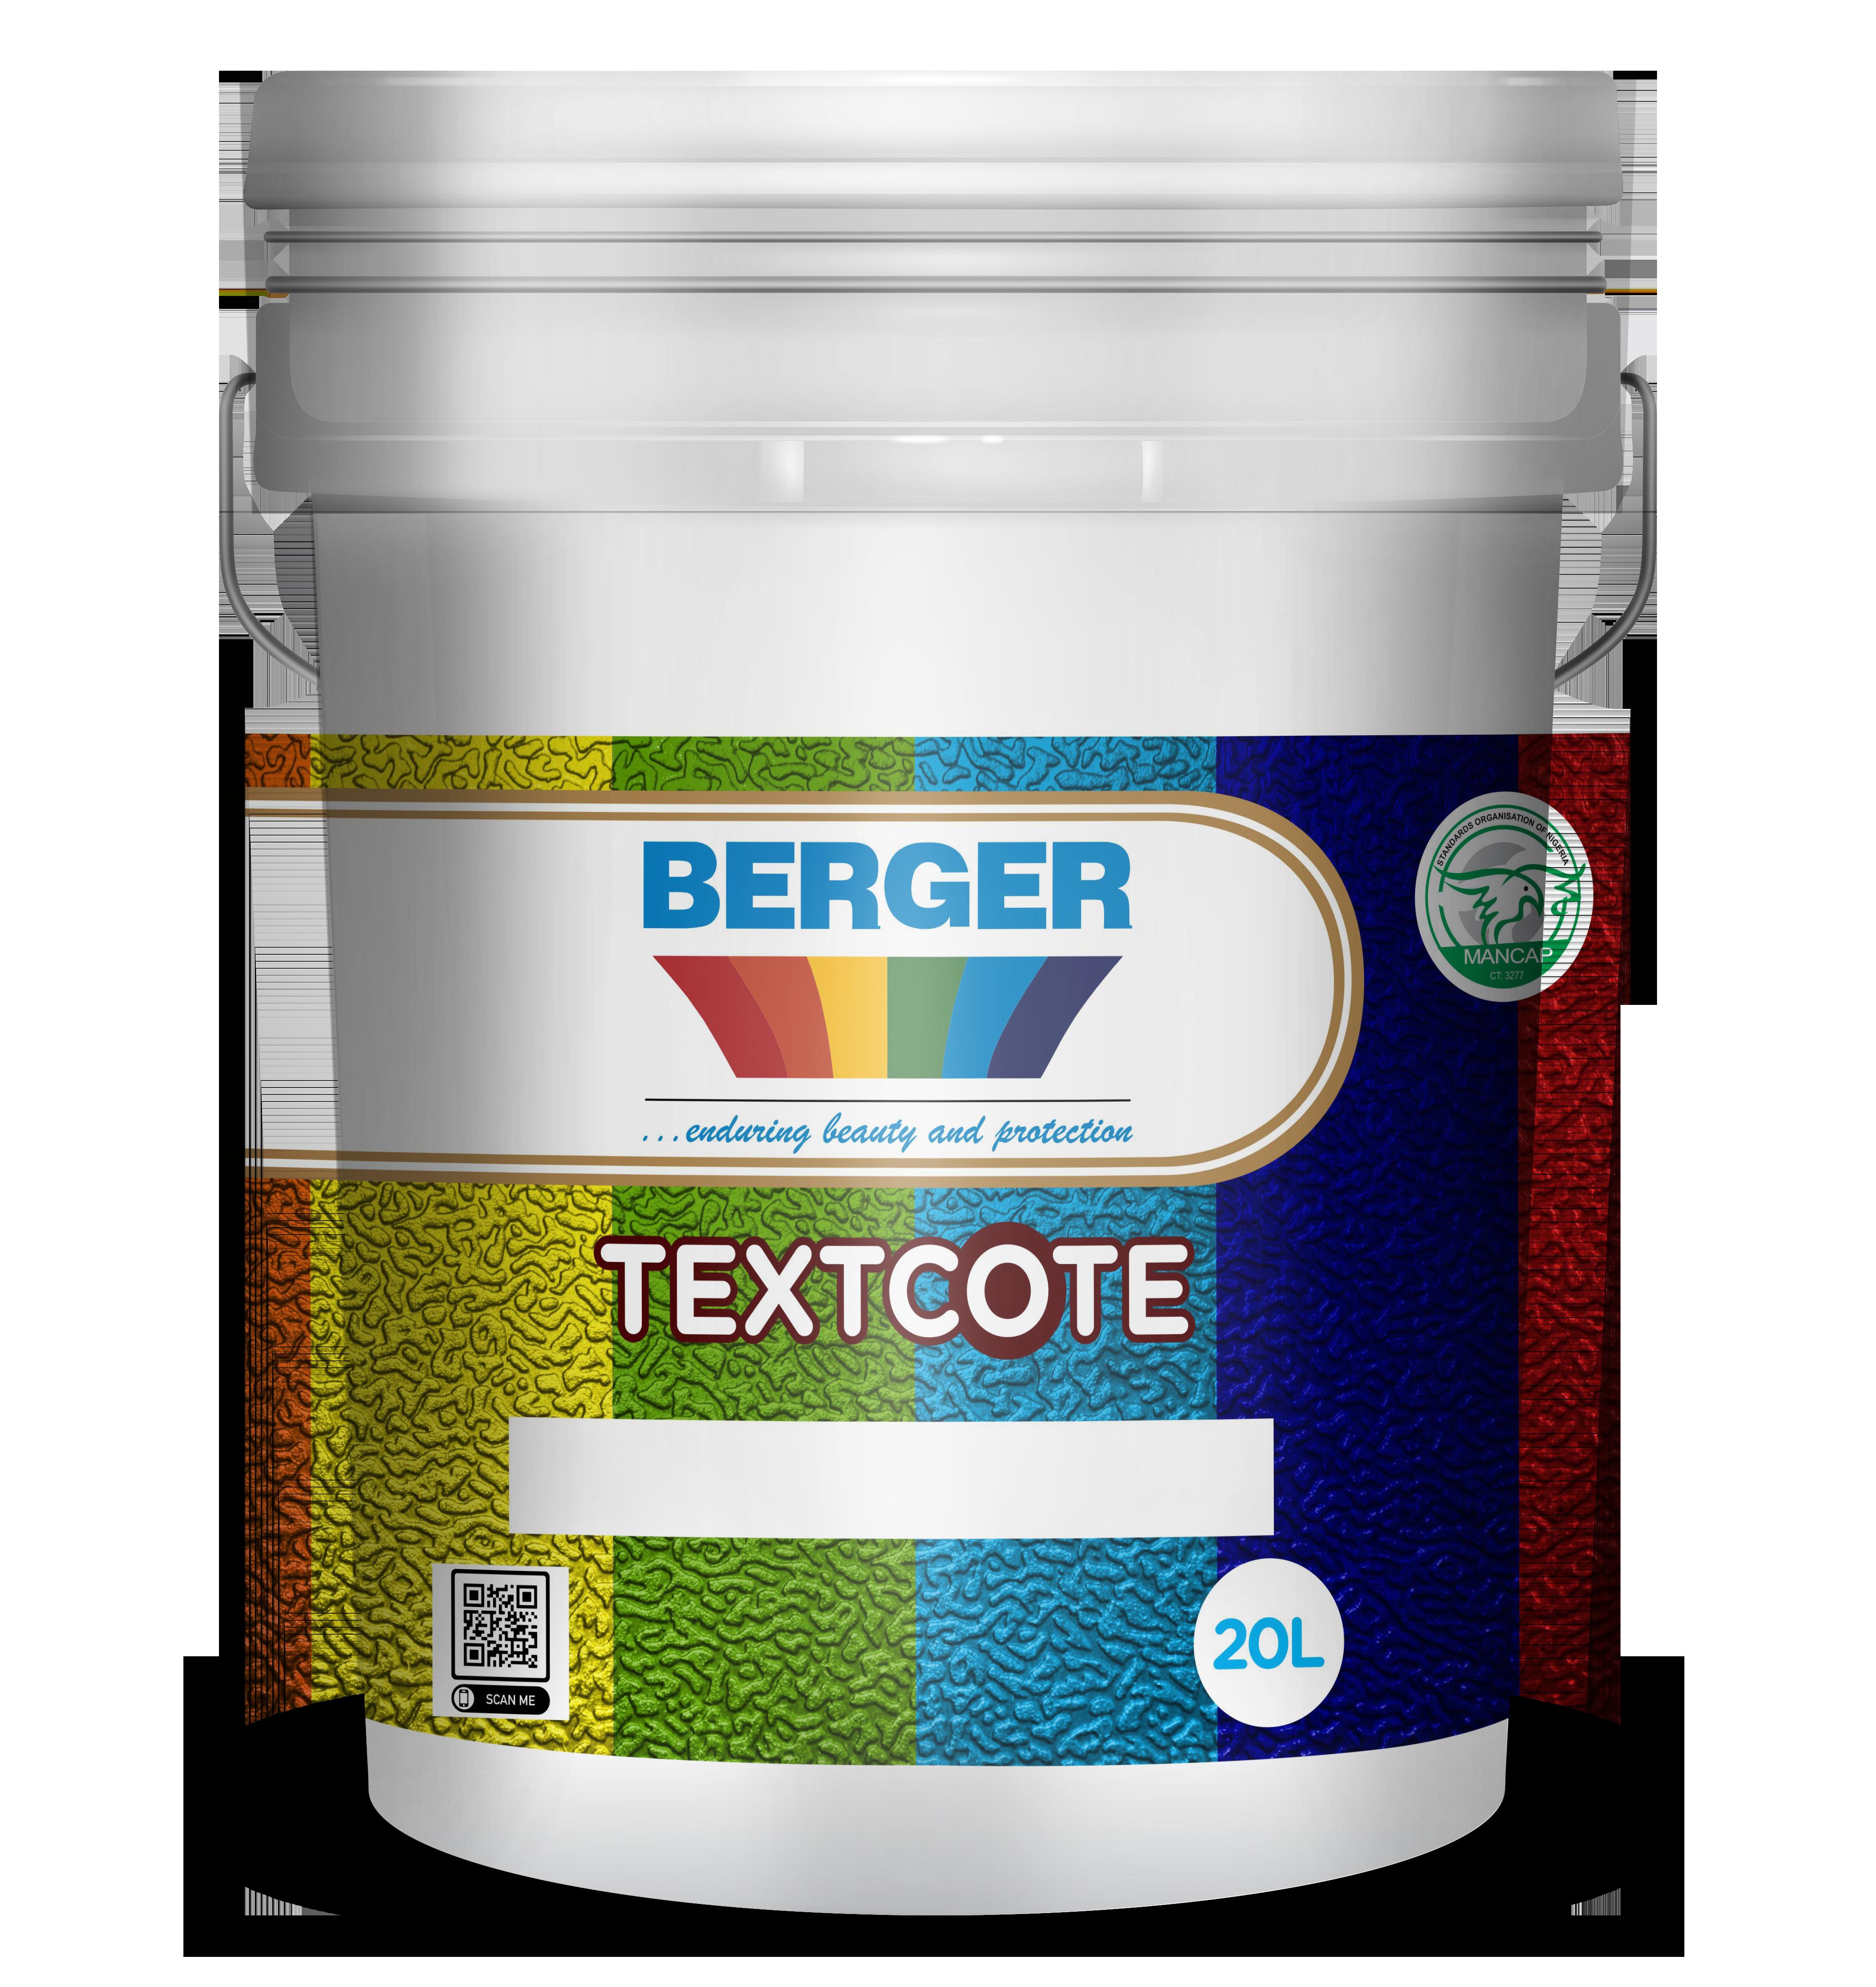 Textcote